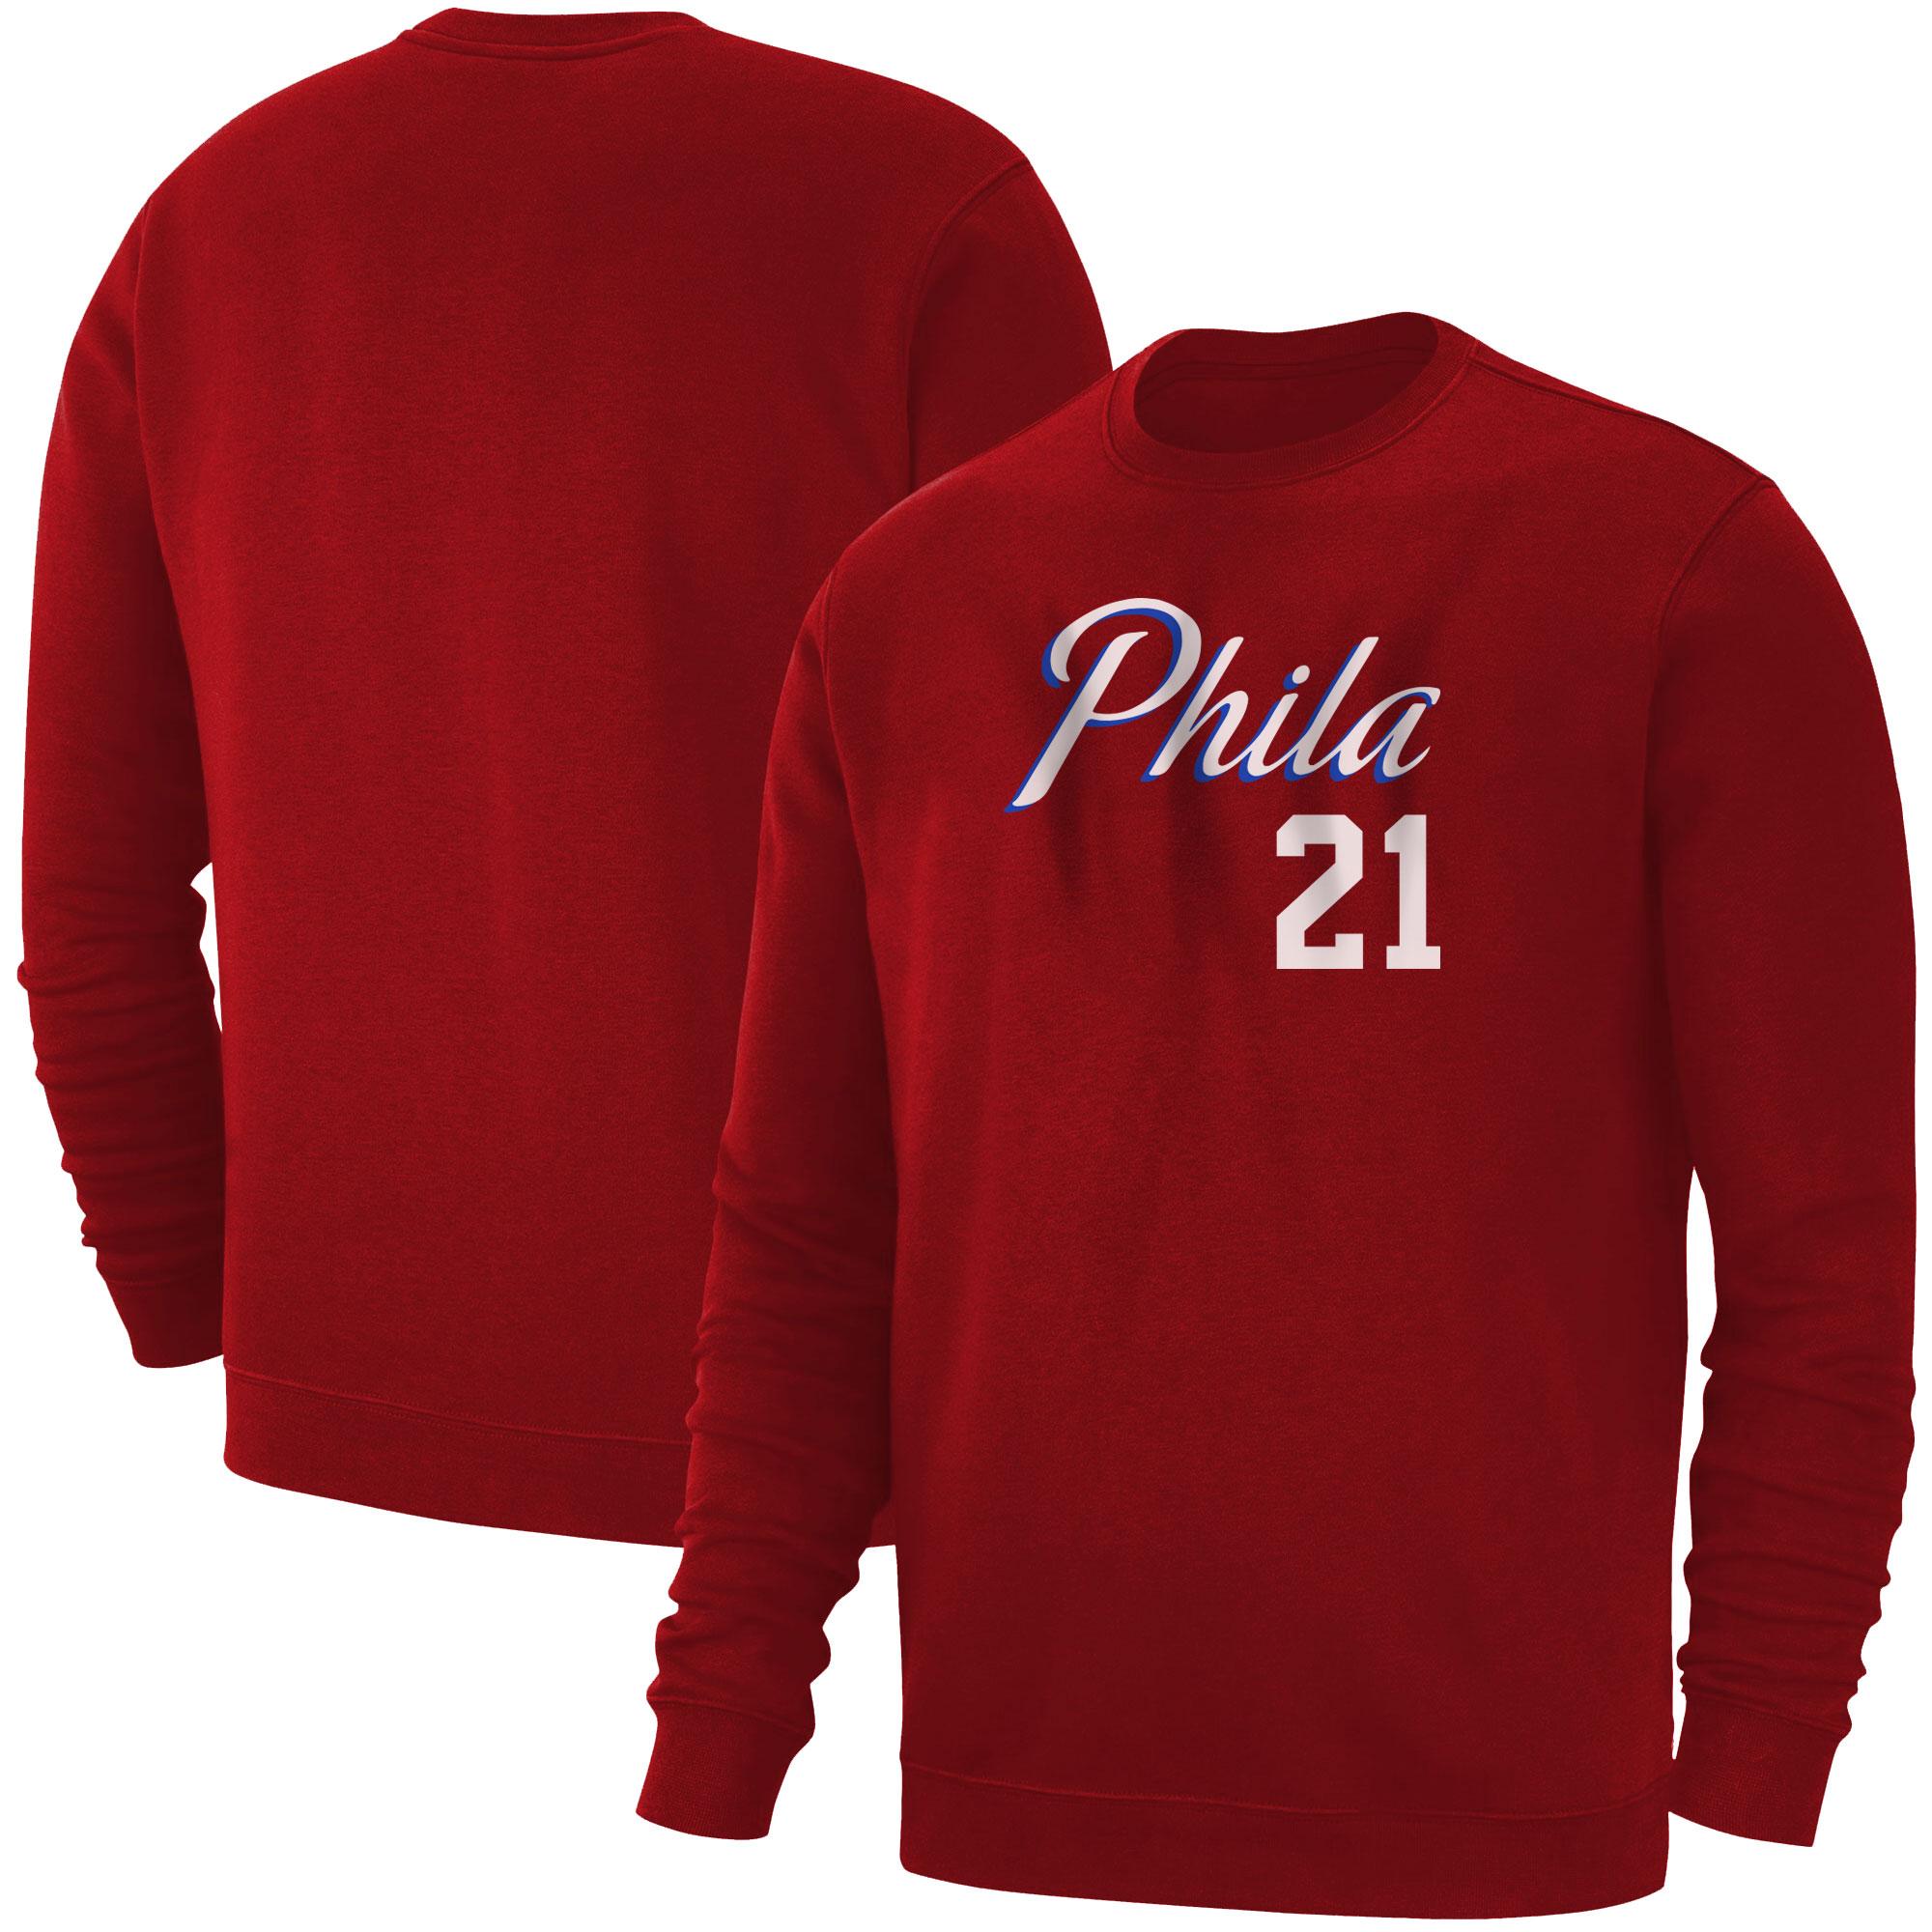 Philadelphia 76ers Joel Embiid Basic (BSC-RED-PLT-504-21)